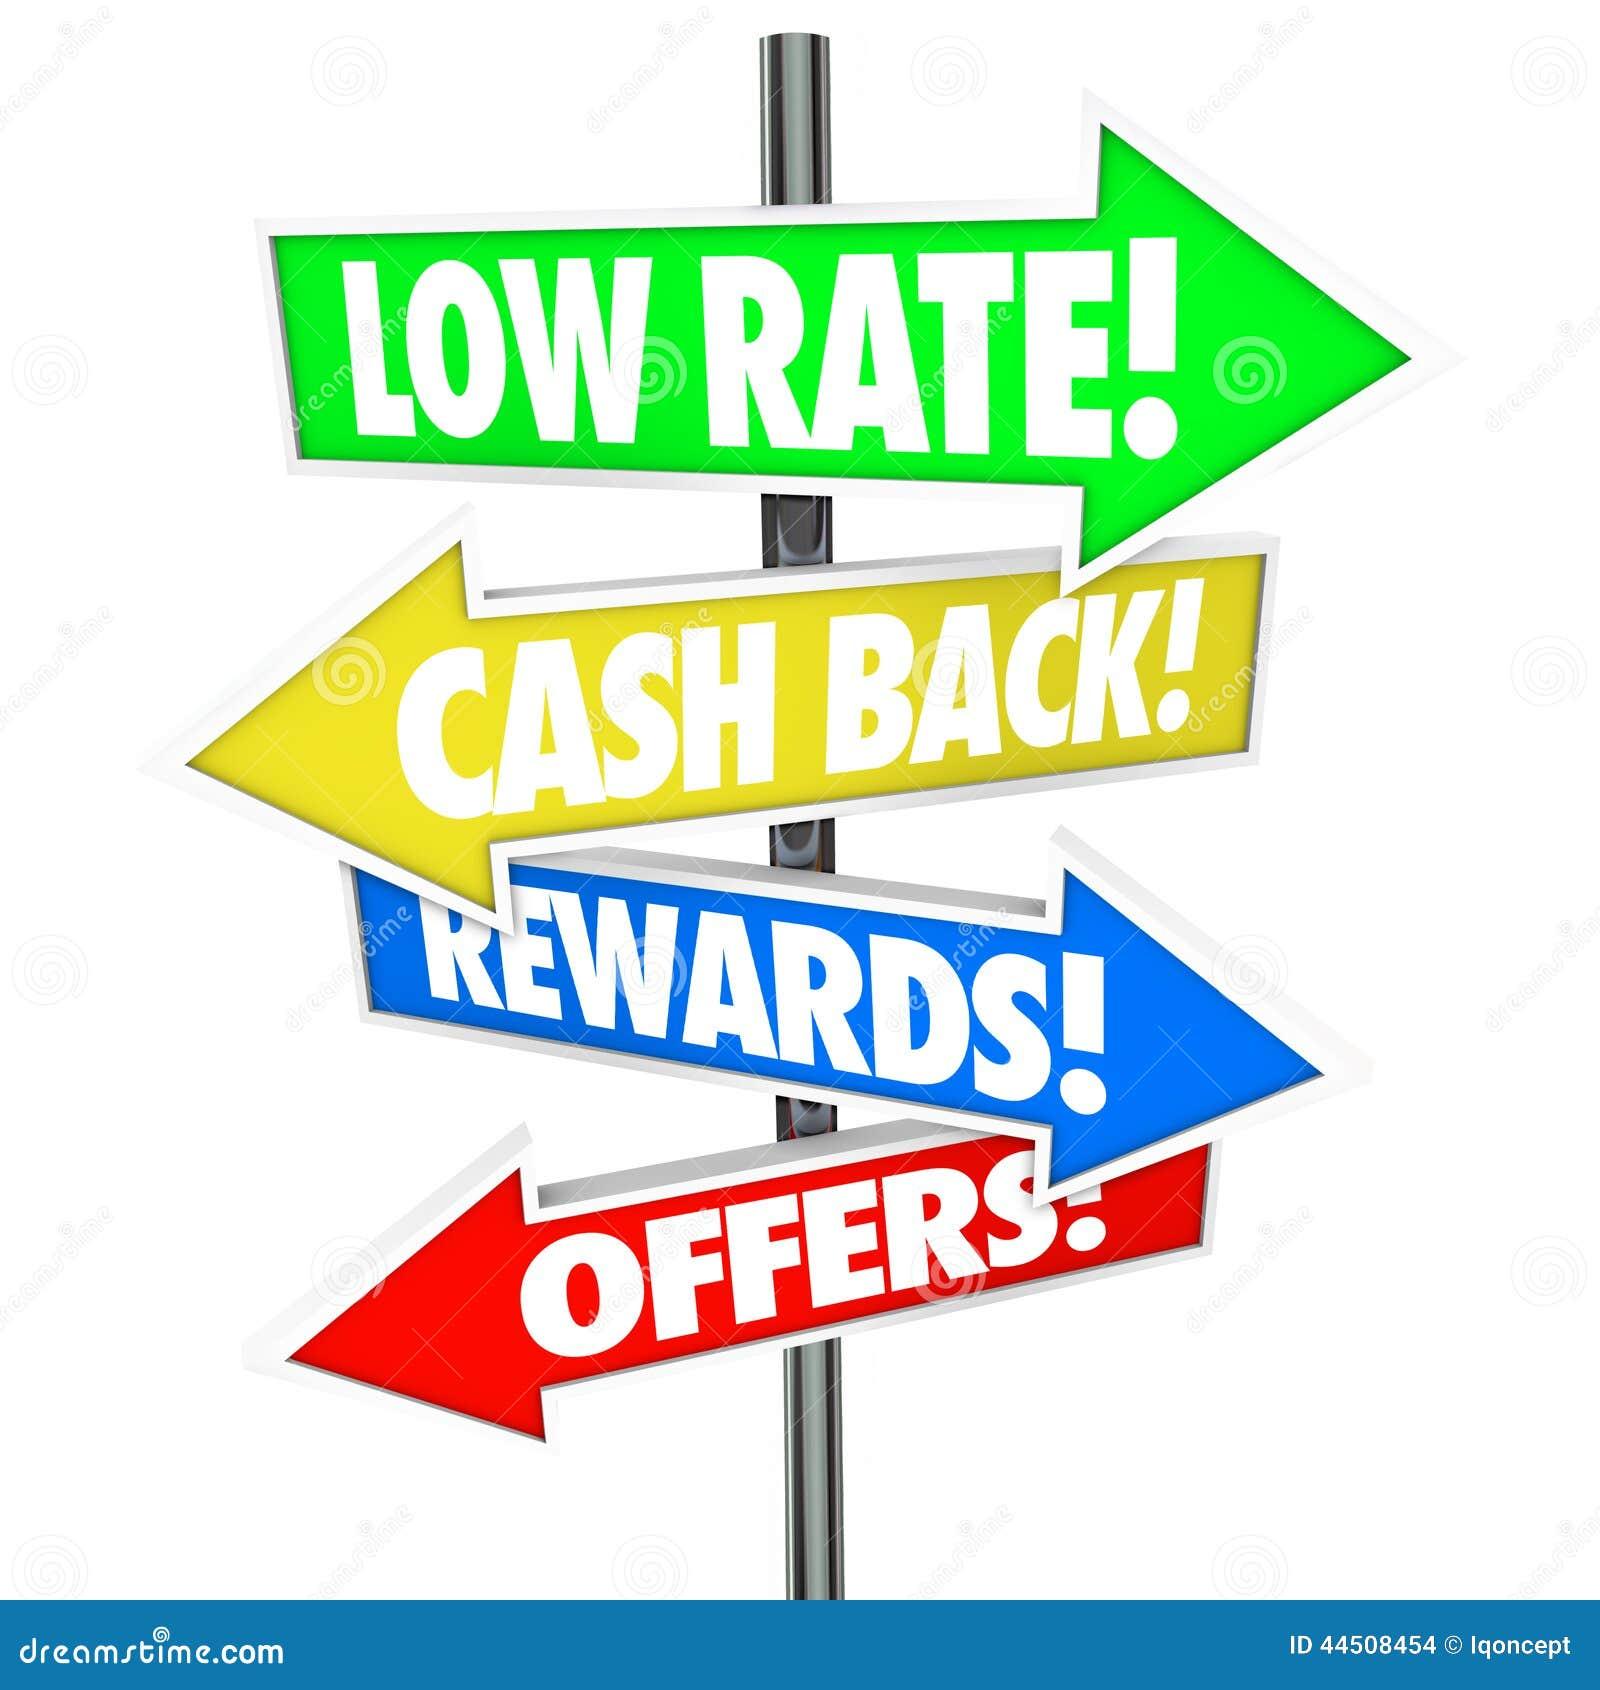 Cash back credit card deals / Blood milk coupon